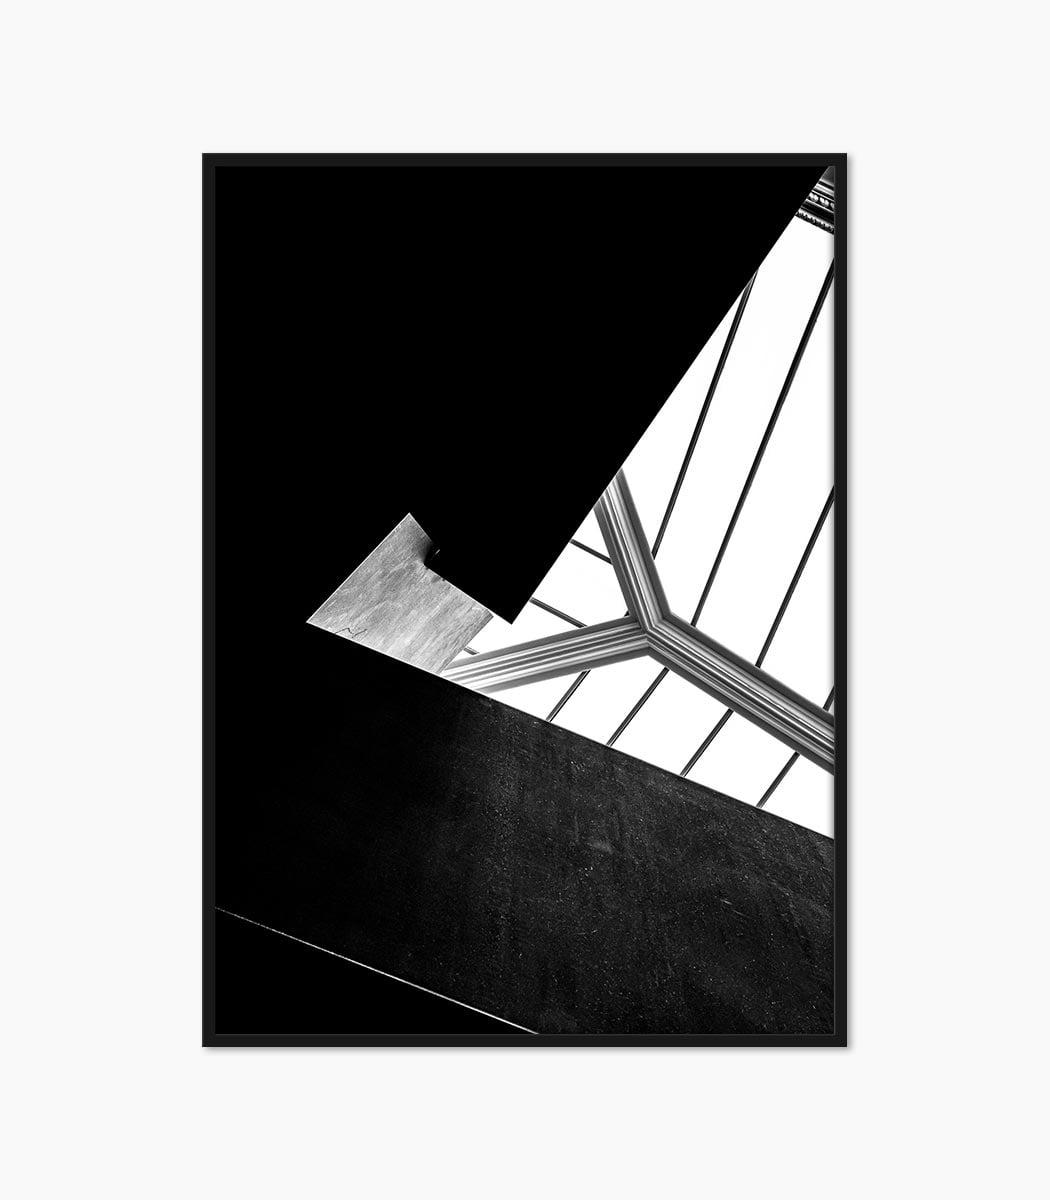 print arhitectura monocrom creat si printat la calitate superioara numai pe www.artwall.ro